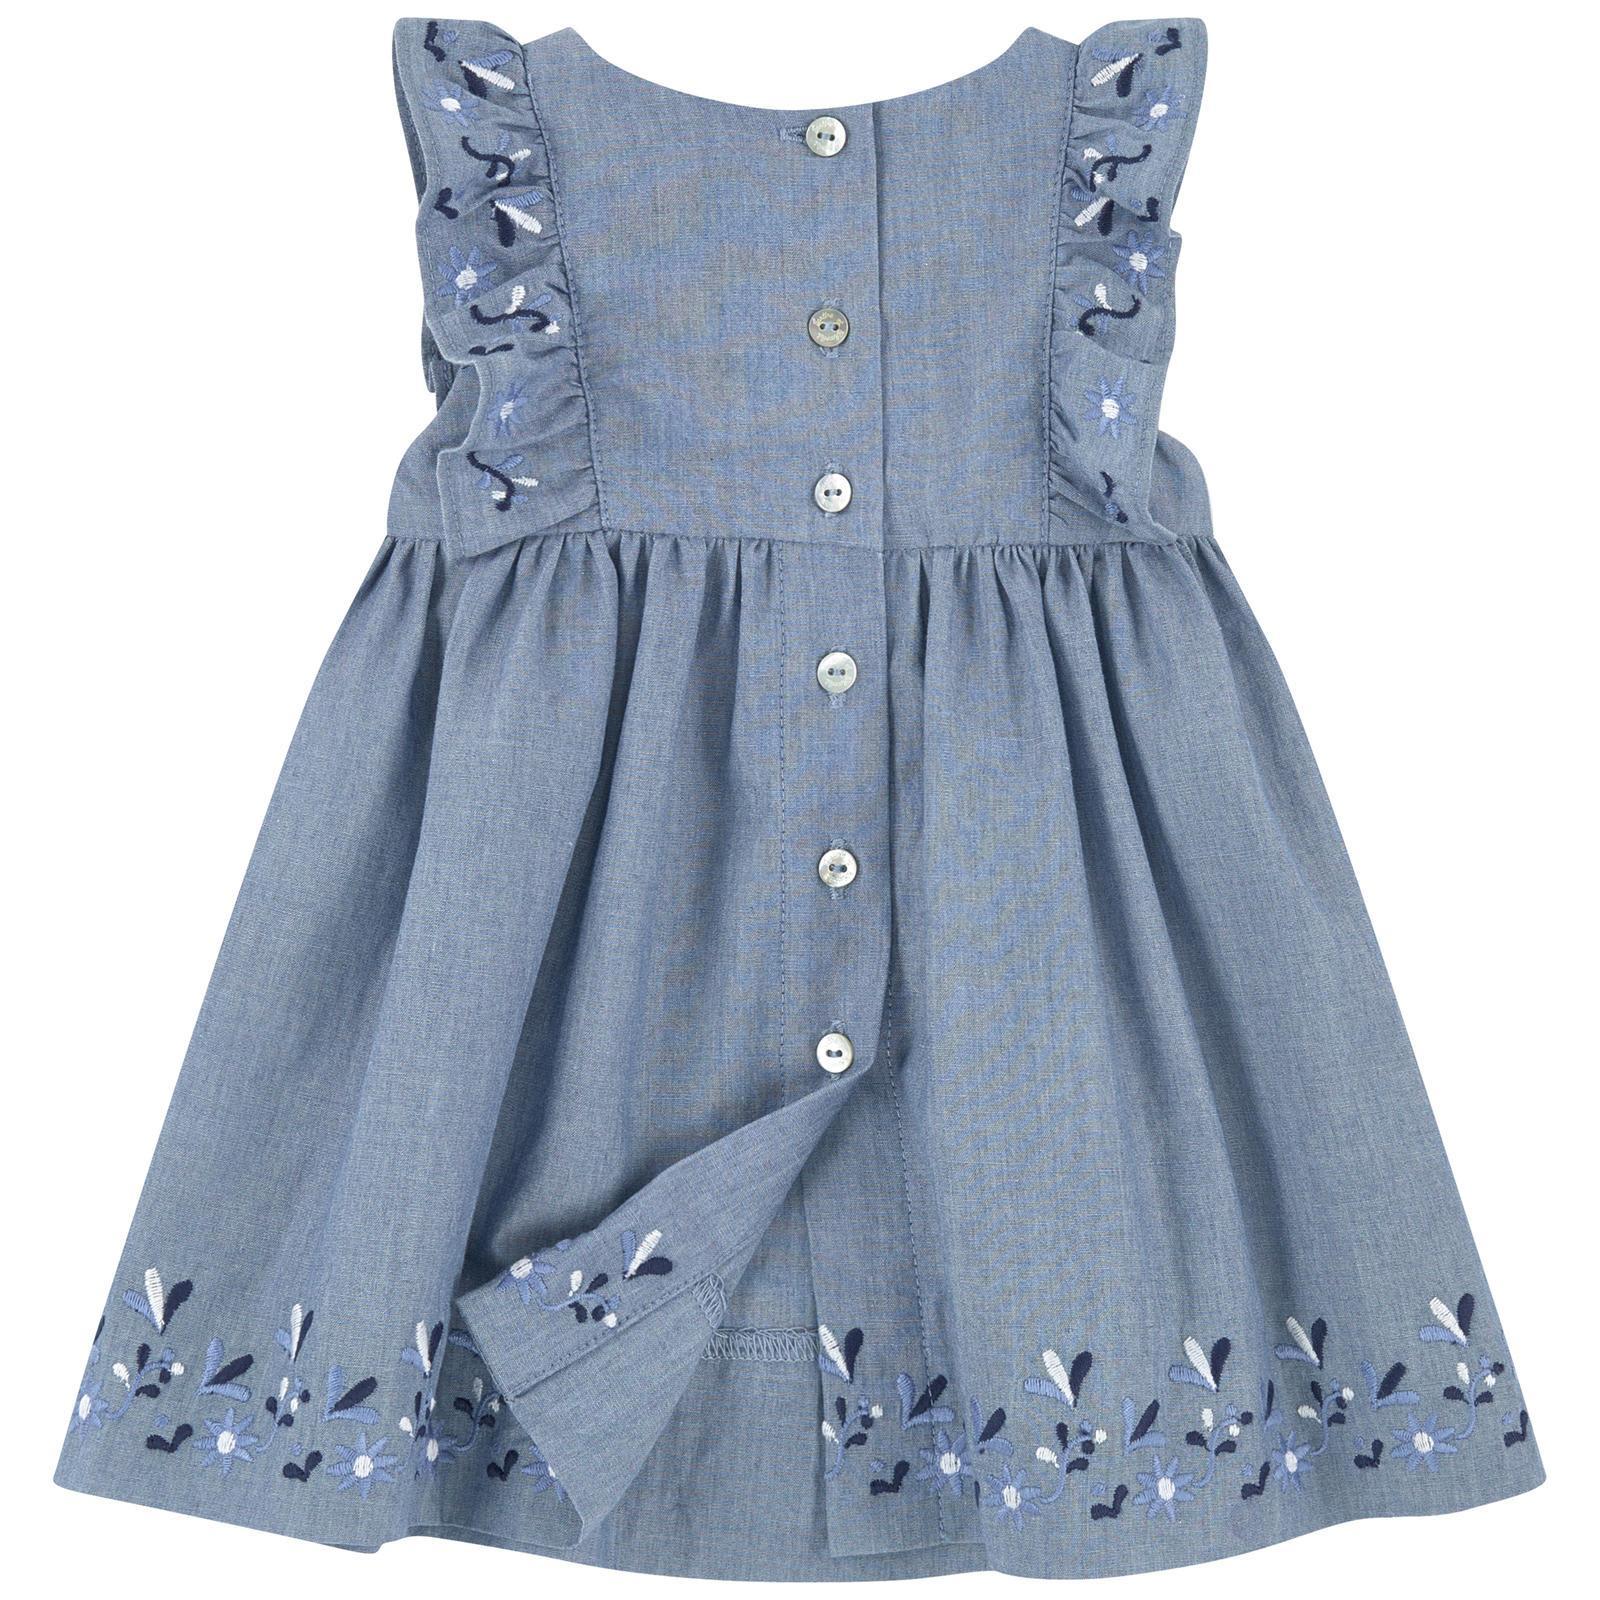 Tartine et Chocolat Blue Chambray Girls Pinafore Dress